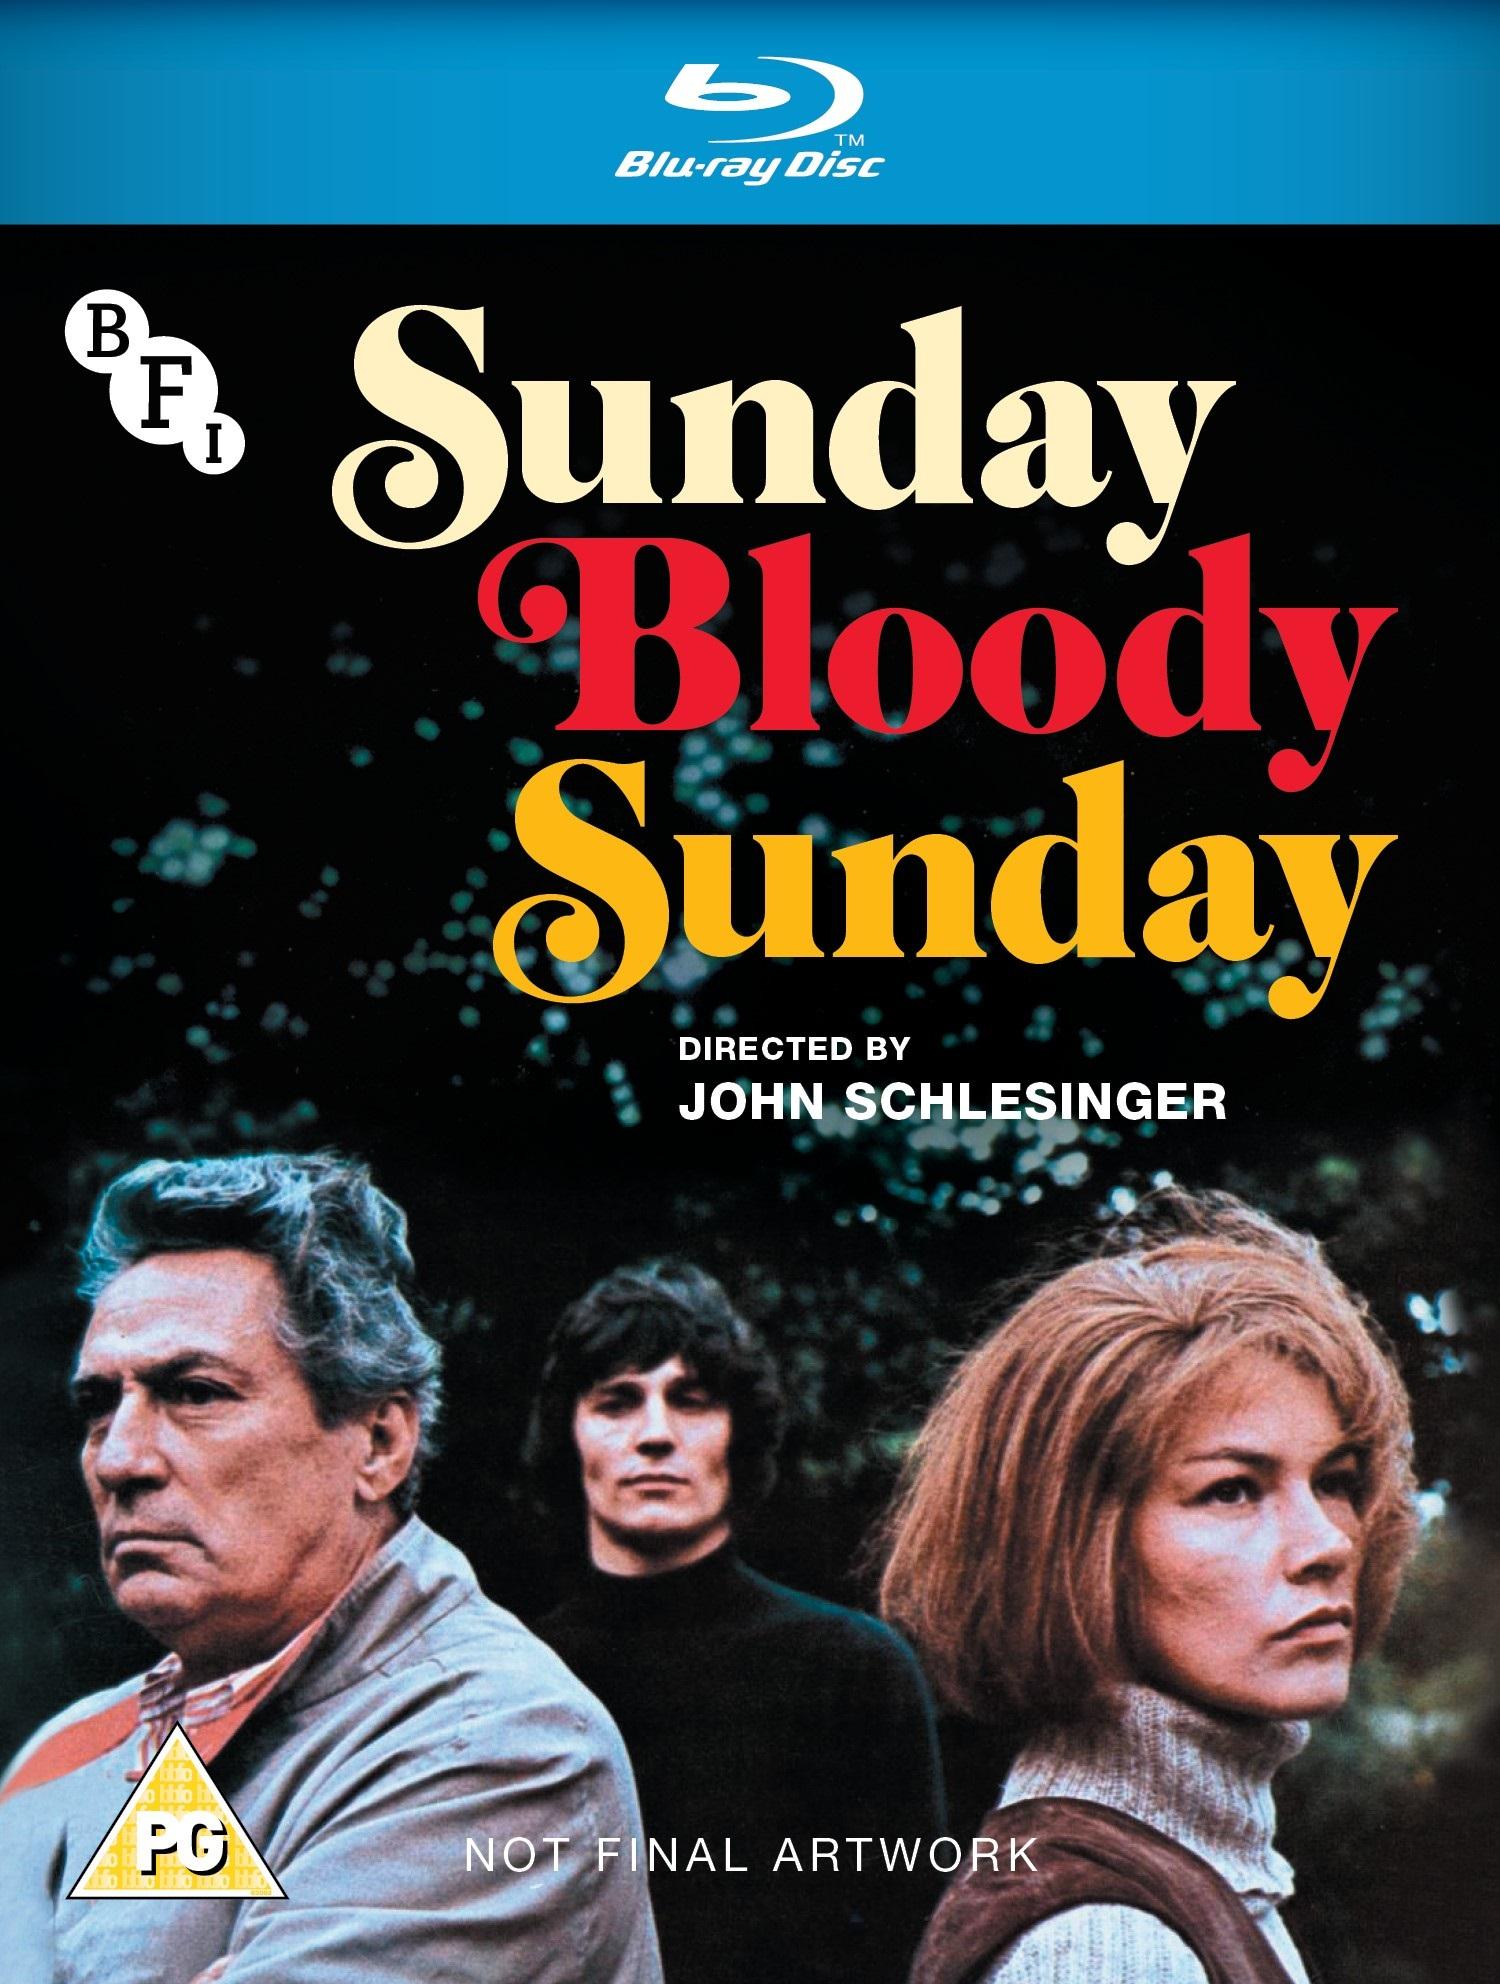 Buy PRE-ORDER Sunday Bloody Sunday (Blu-ray)